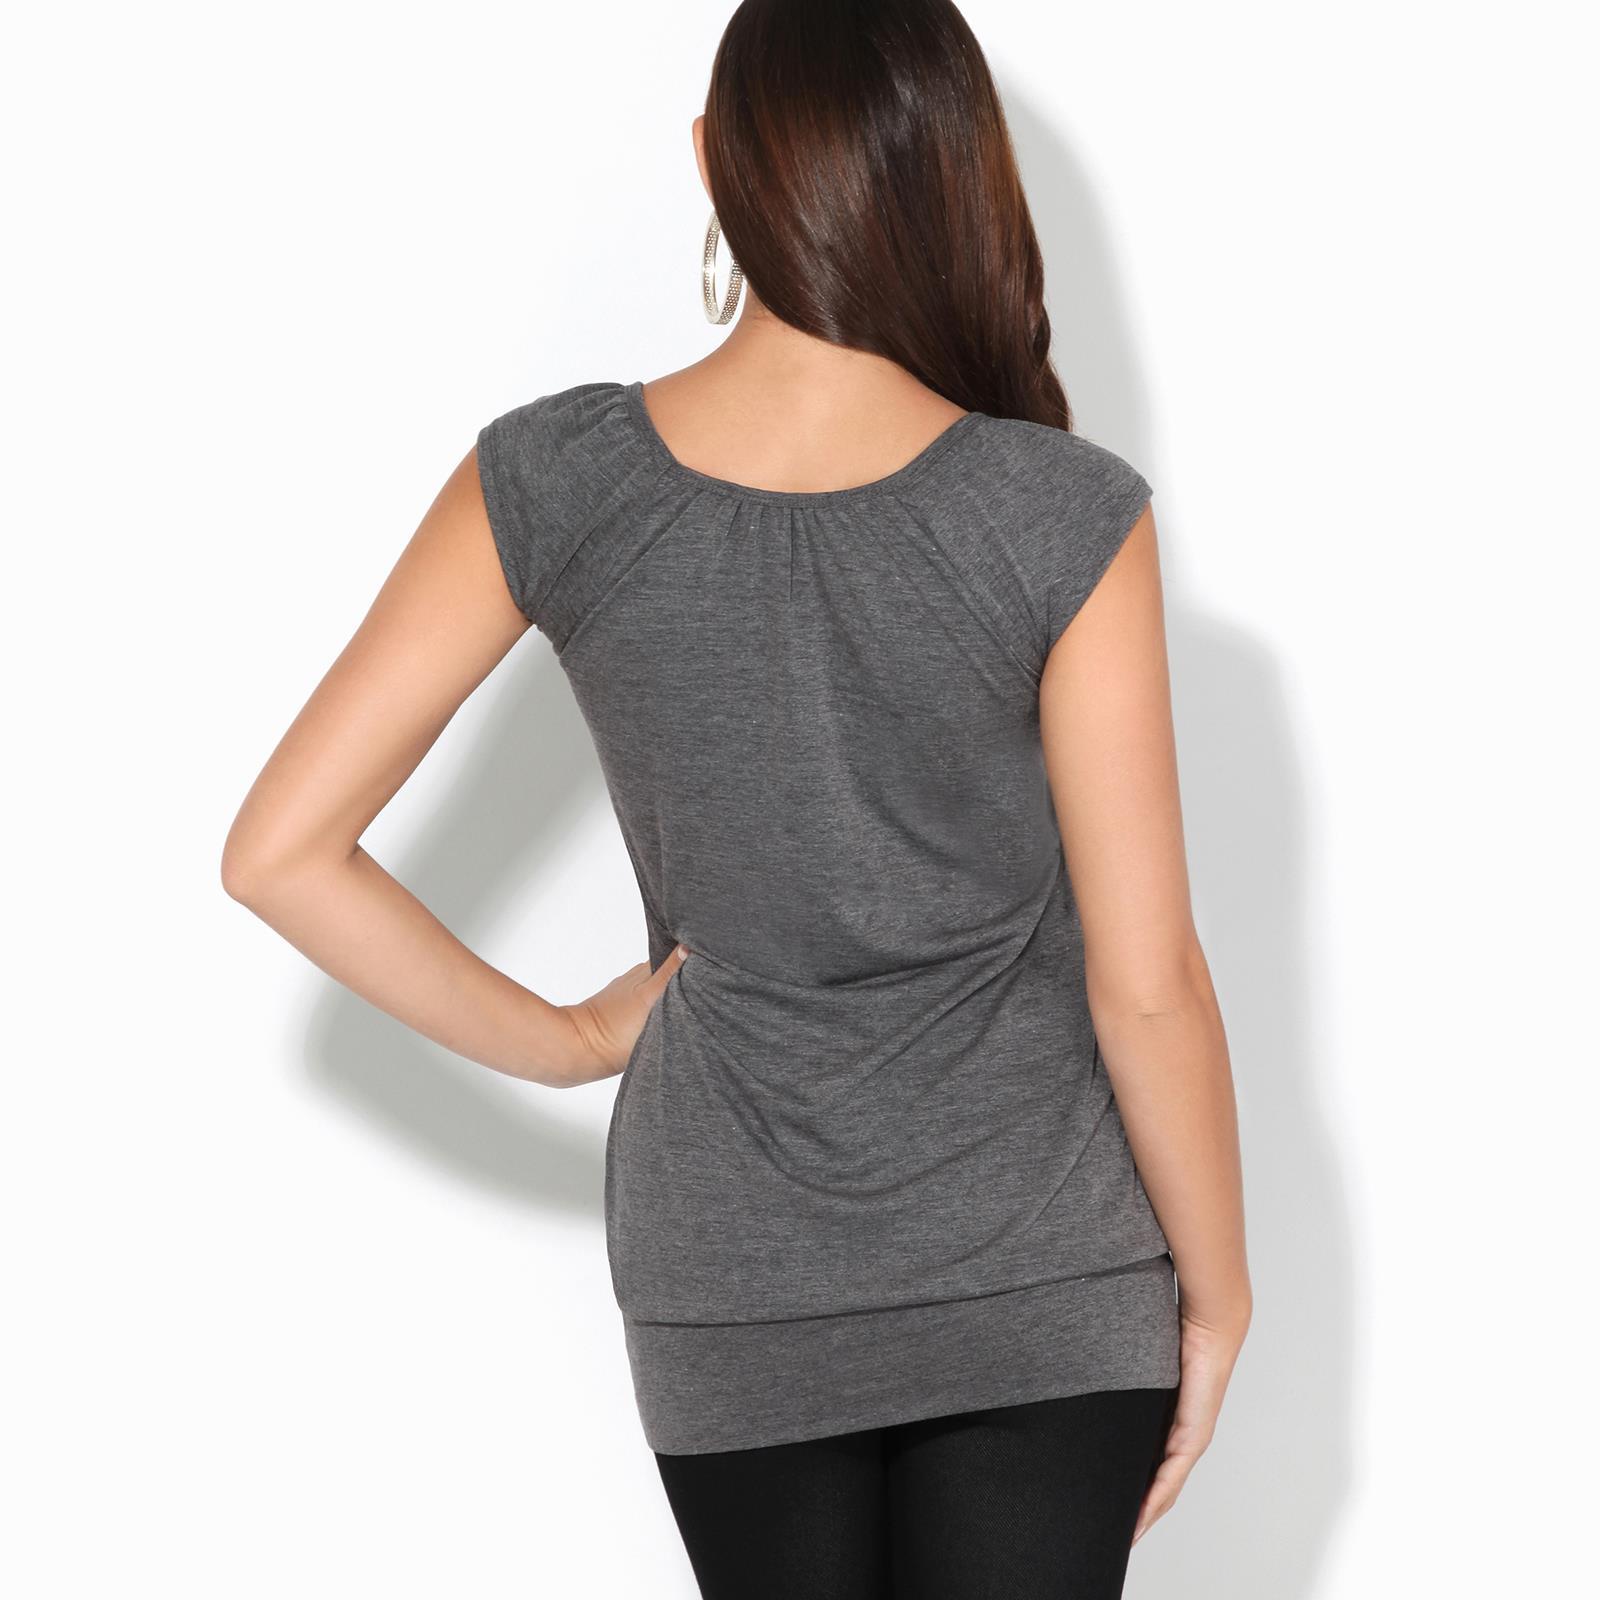 Womens-Ladies-Scoop-Neck-Blouse-V-T-Shirt-Long-Short-Sleeve-Plain-Loose-Top thumbnail 16